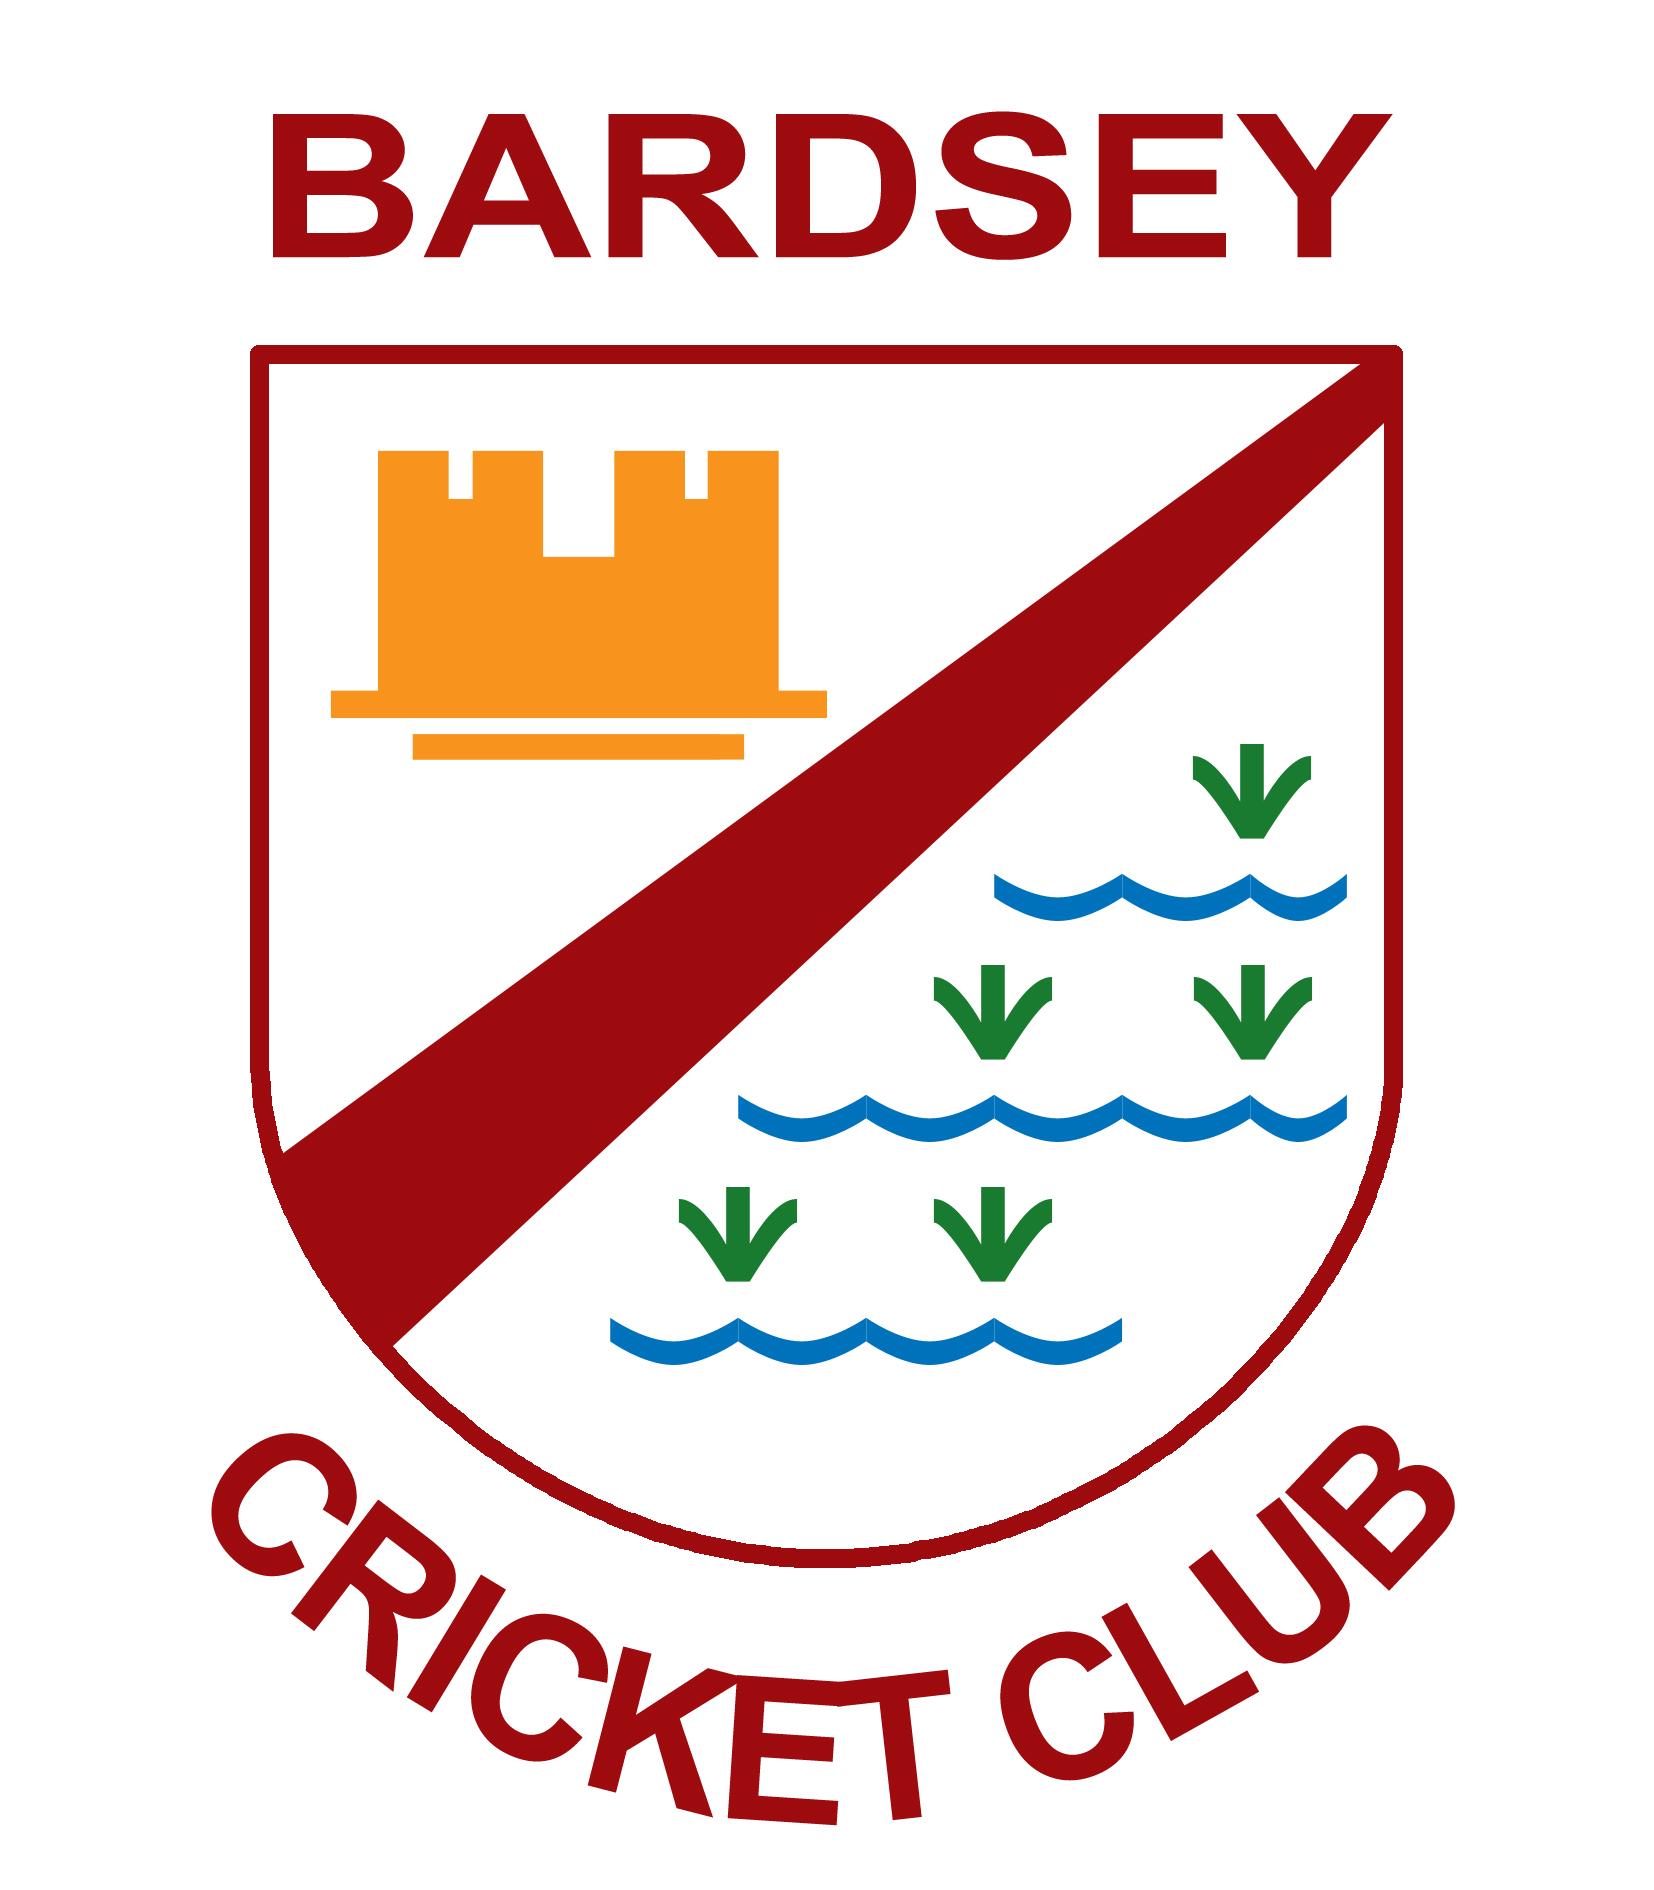 BardseyCC_logo_4_colour